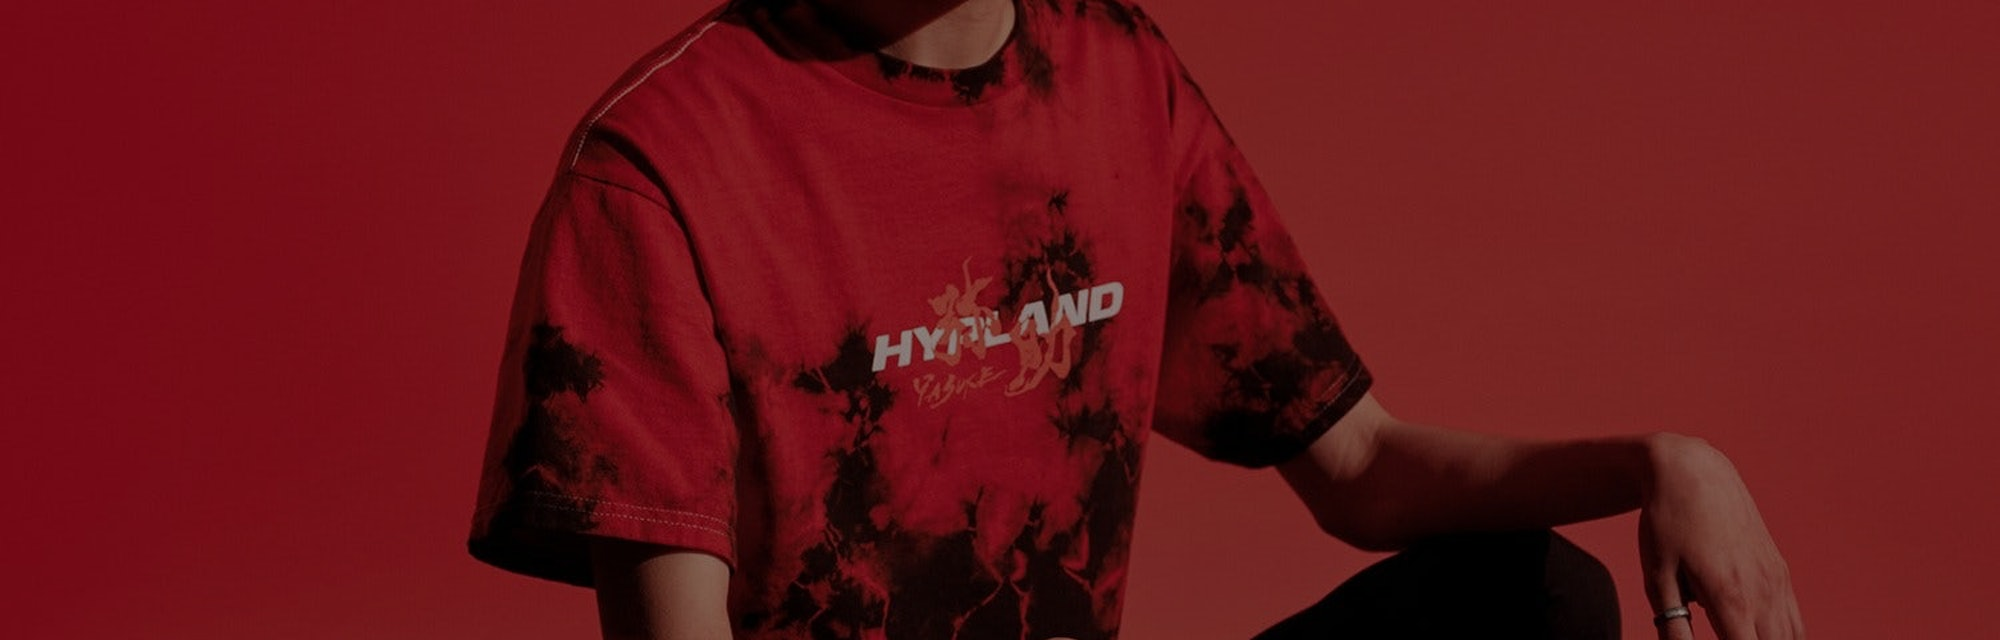 Hypland Yasuke Netflix T-shirt